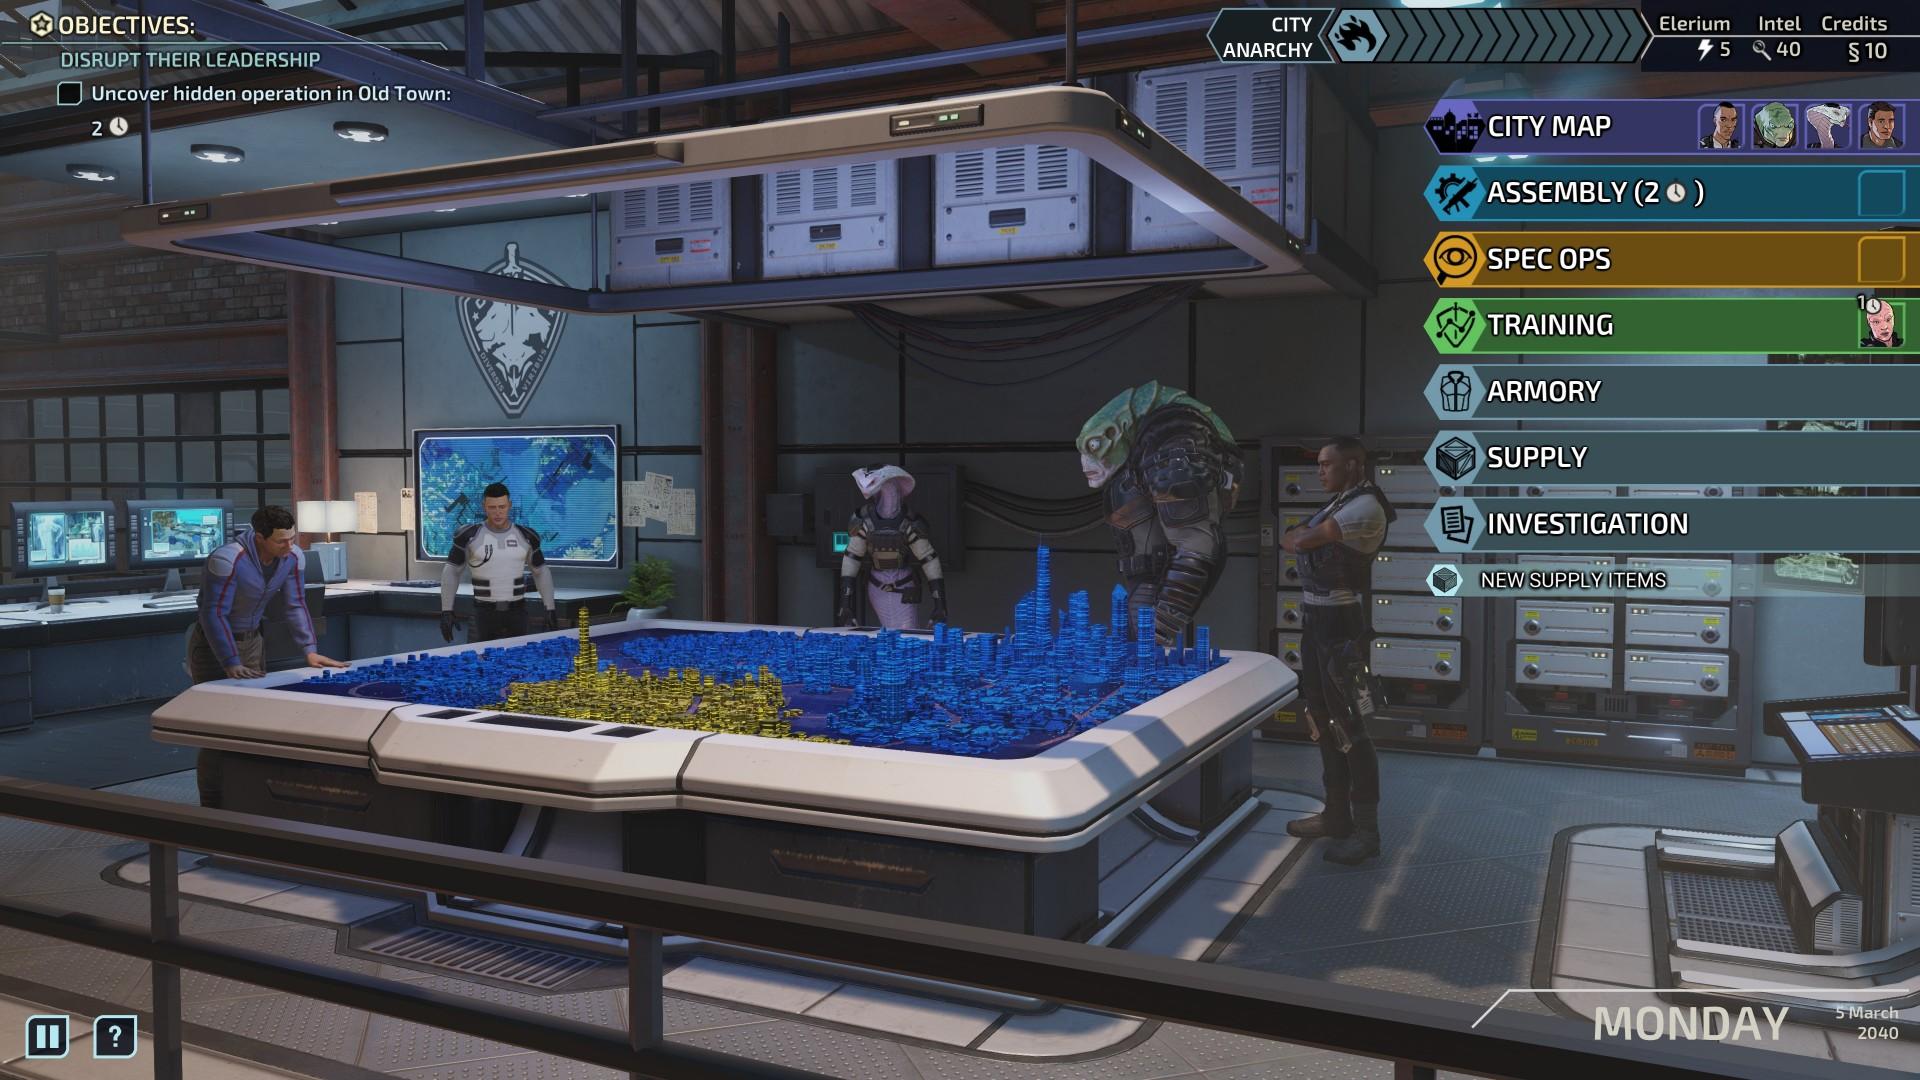 Chimera Squad: Addon für Strategiespiel Xcom angekündigt - Artwork von Xcom Chimera Squad (Bild: 2K Games)